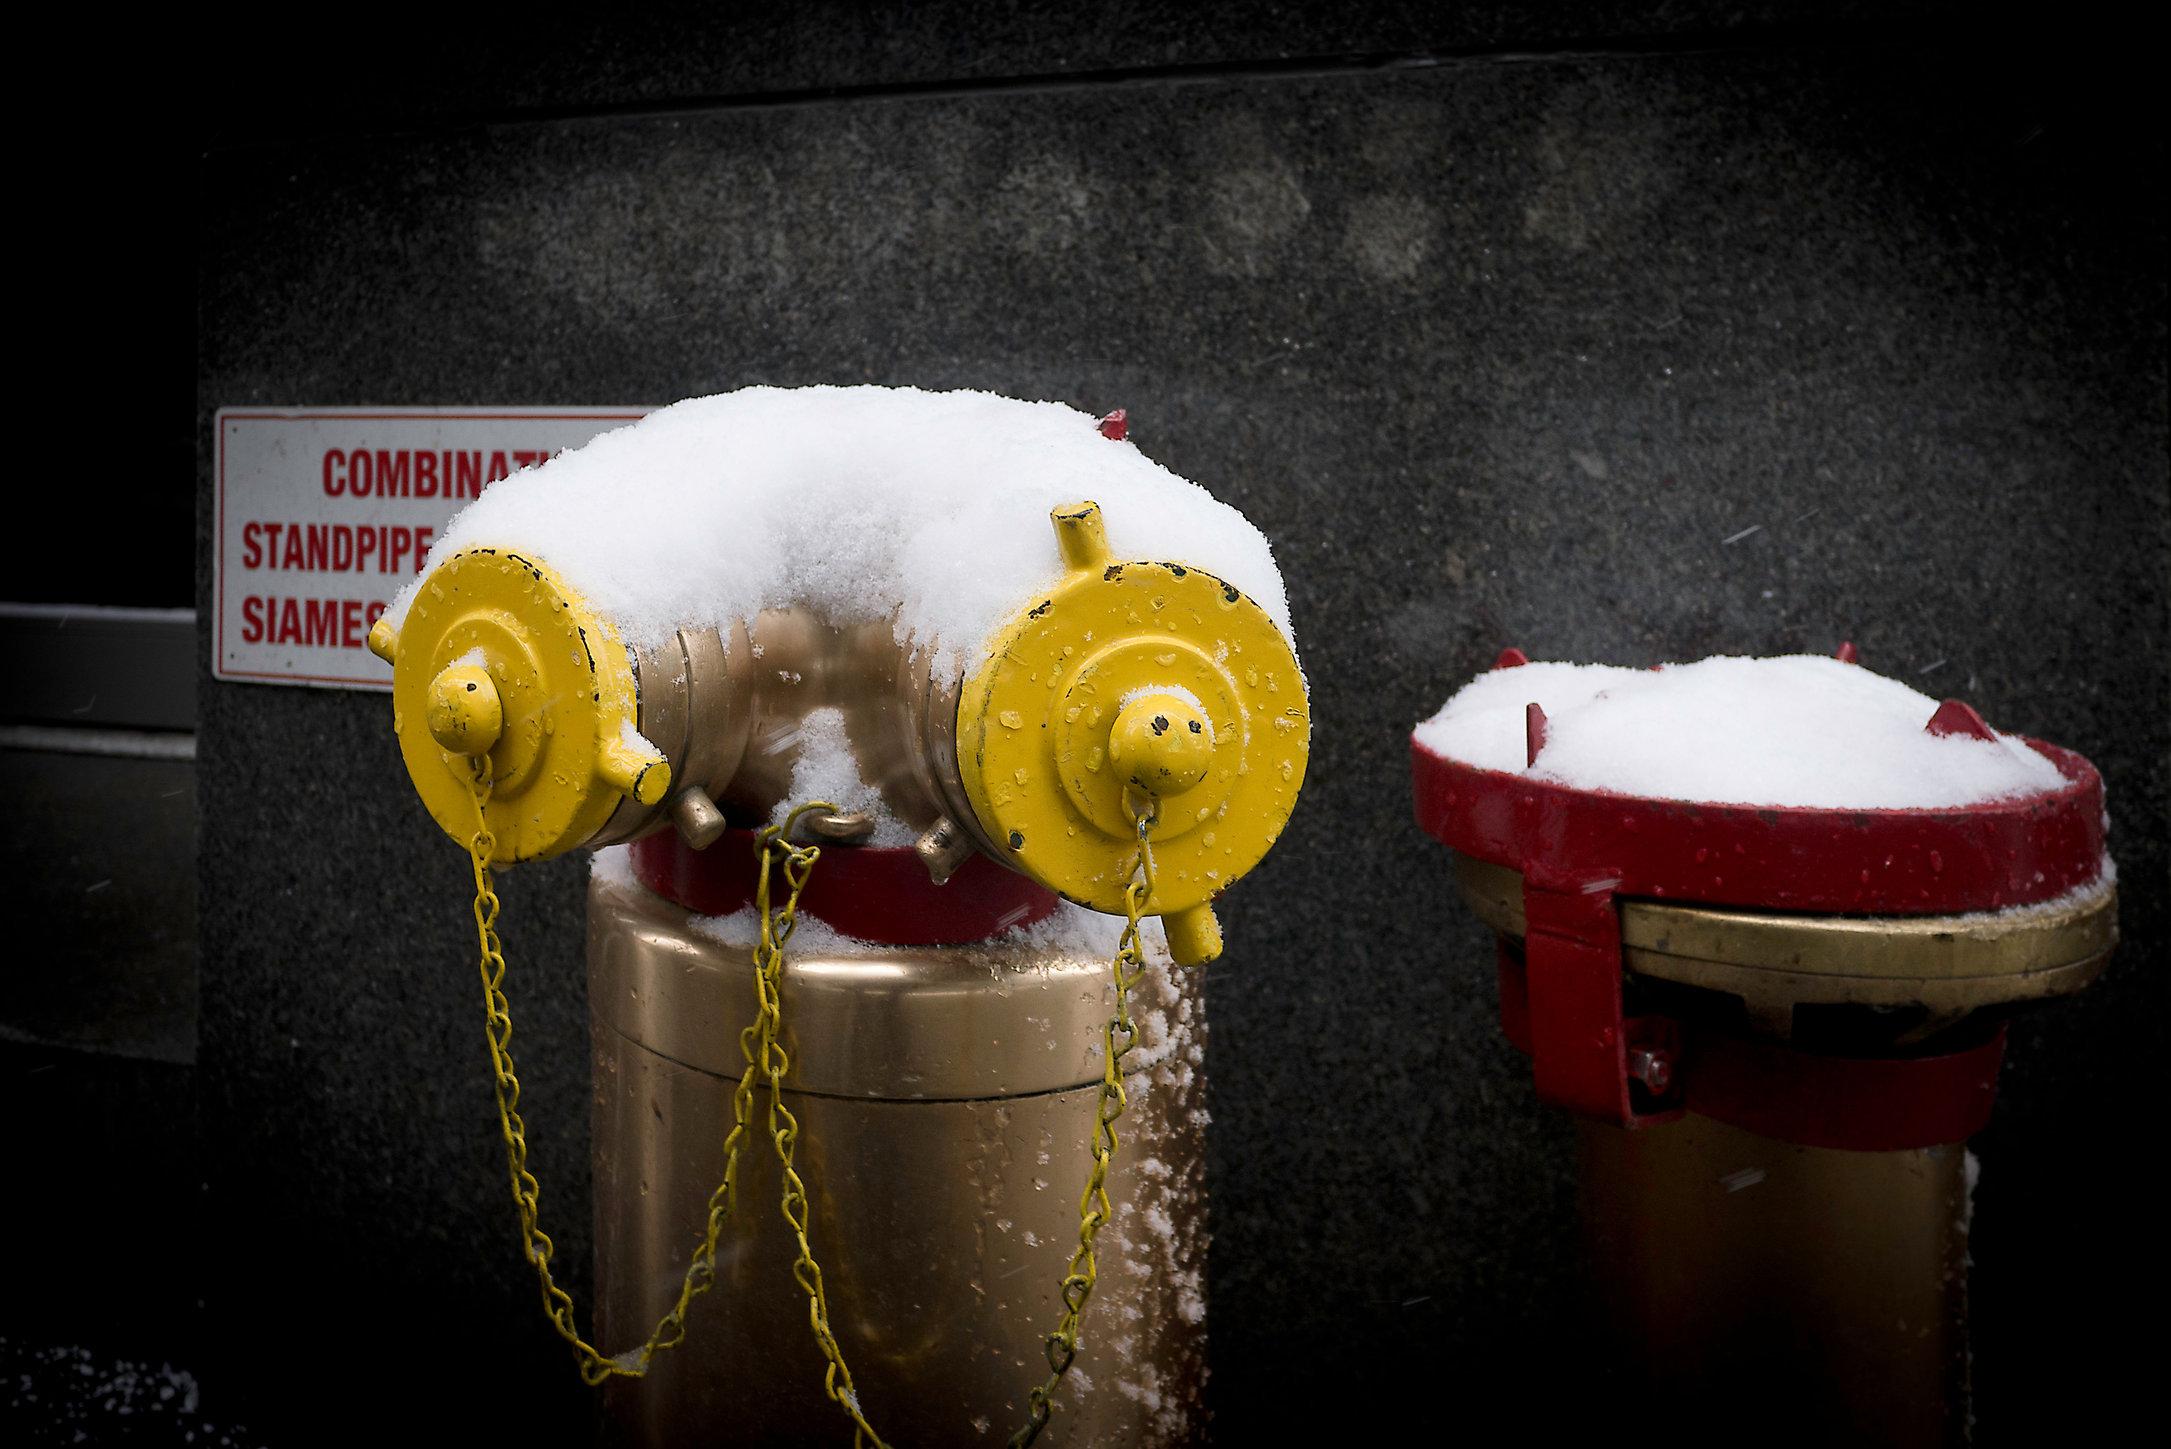 Siamese in Snow, NY